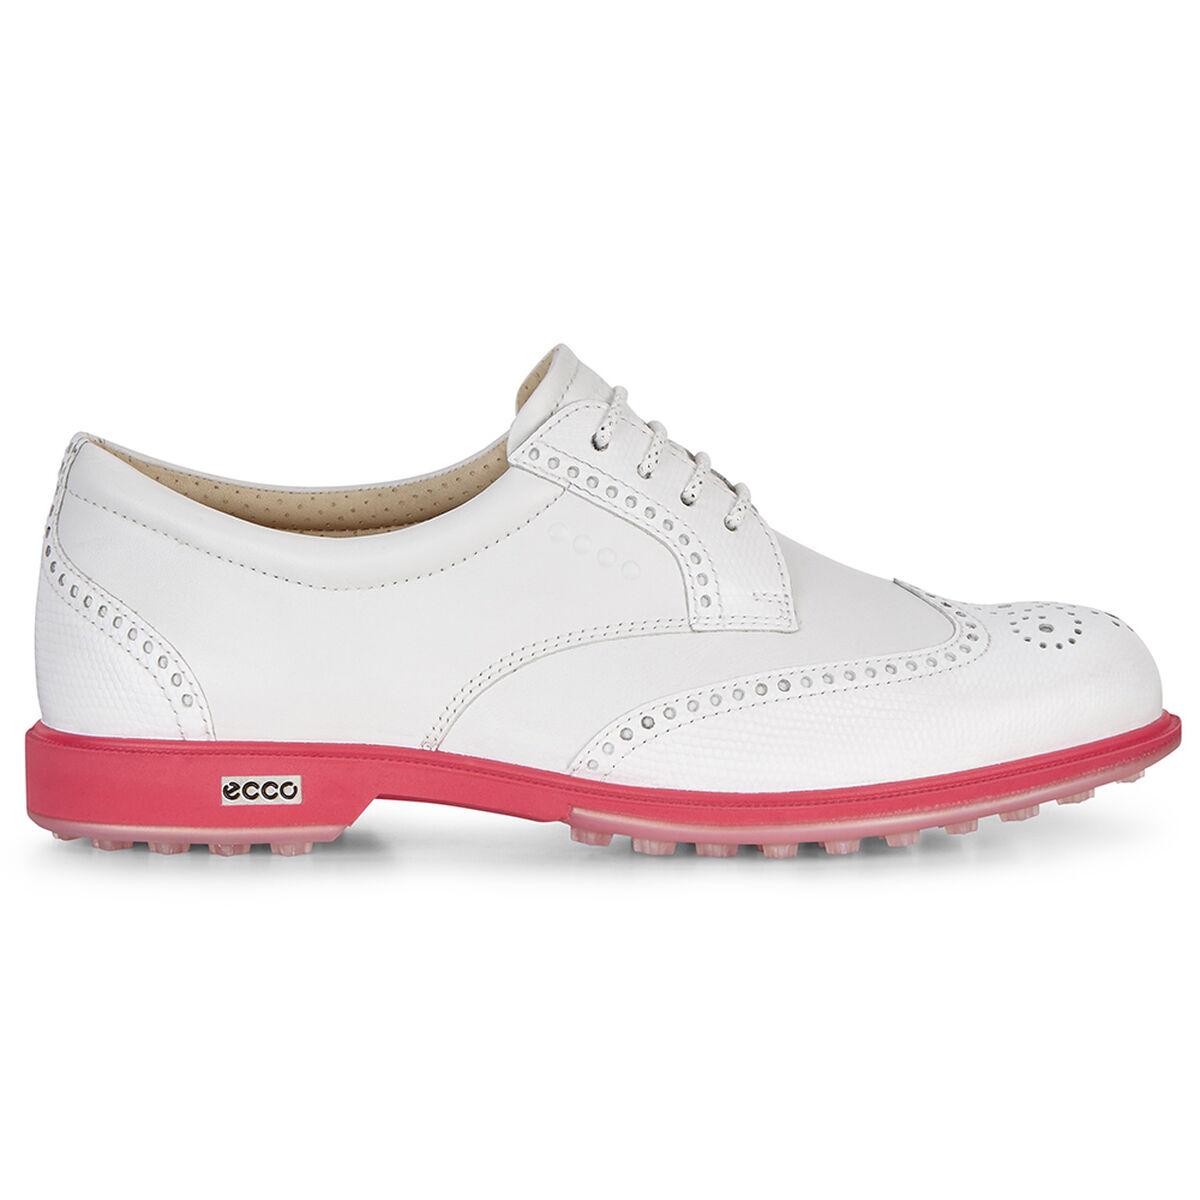 9981ce9d85191e ECCO Classic Hybrid Women's Golf Shoe - White/Pink | PGA TOUR Superstore